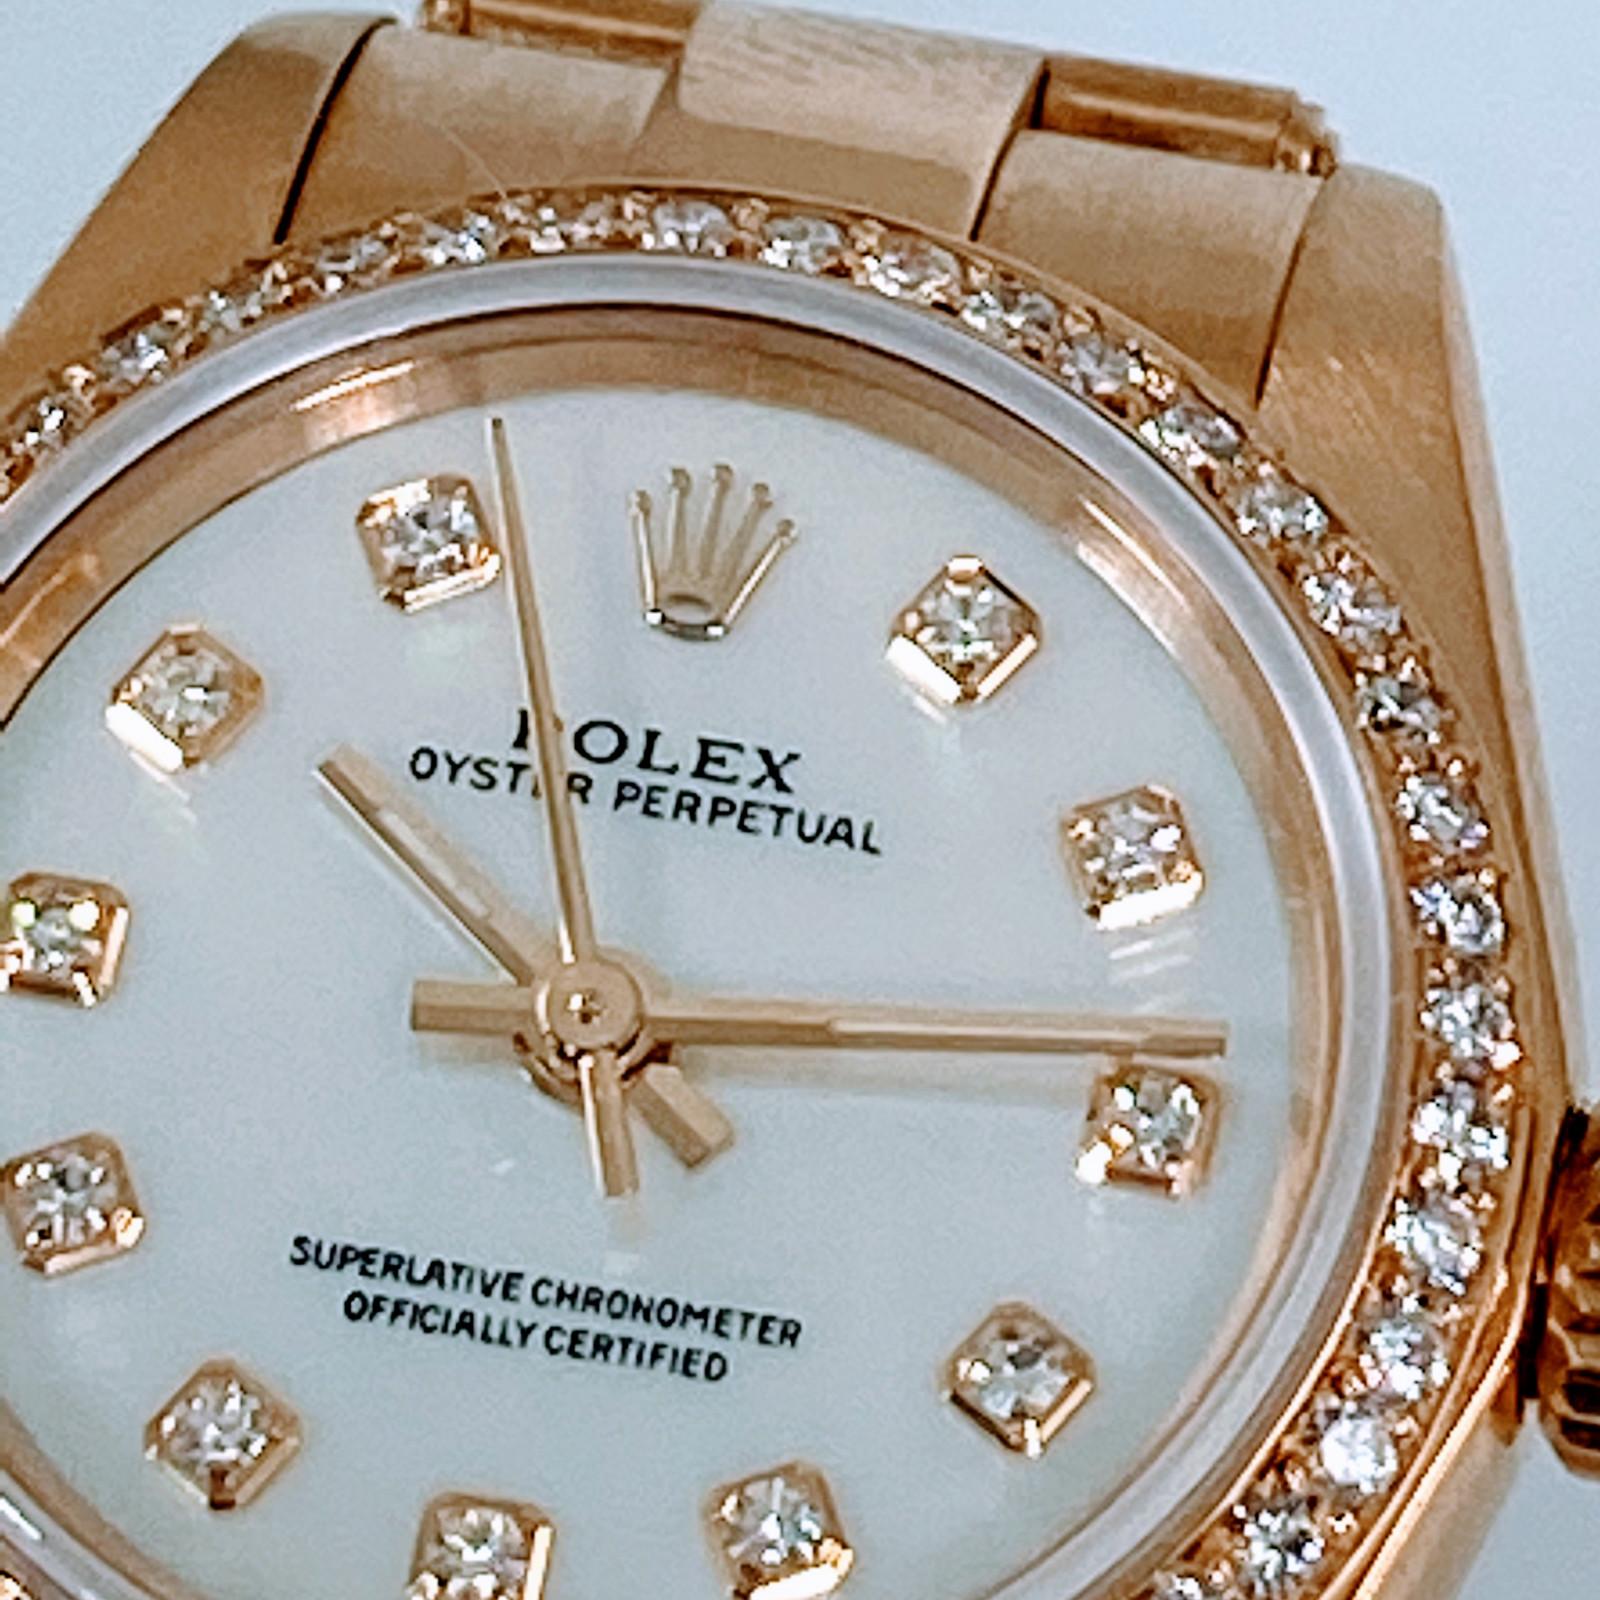 Rolex Diamond Oyster Perpetual Model 67188